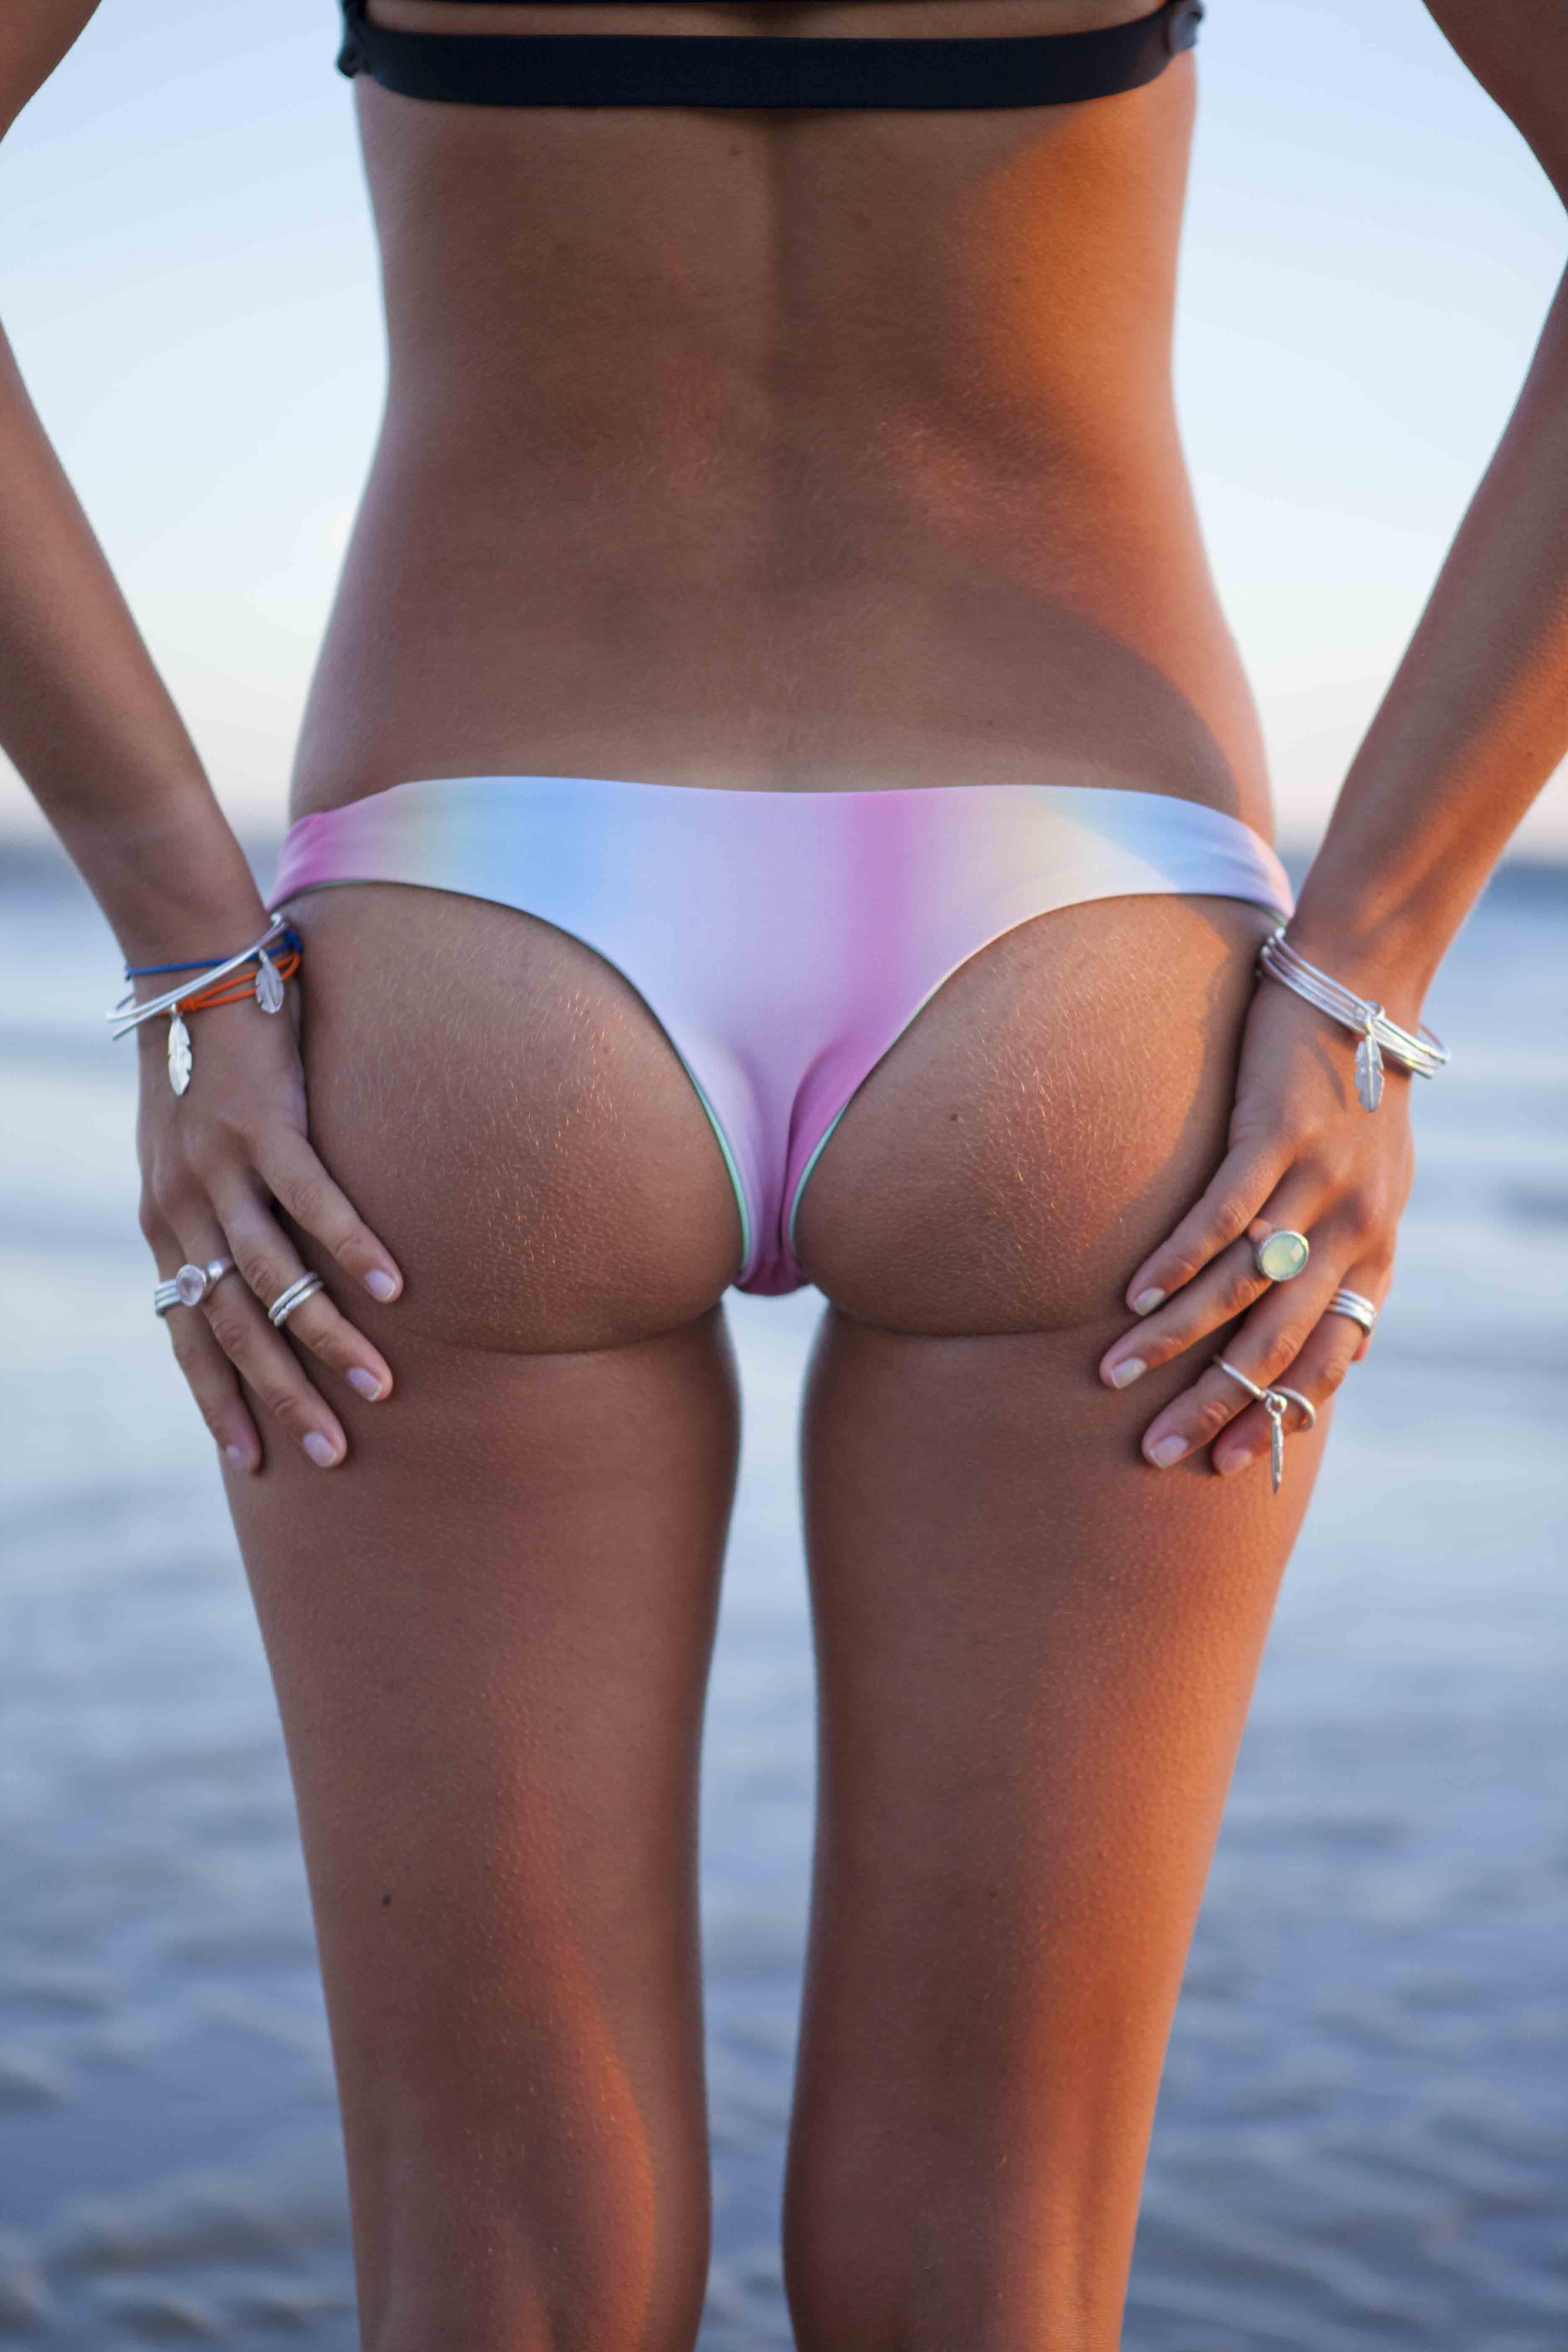 brazilian bikini bottoms brazilian style bikini bottoms mermaid orjulxd